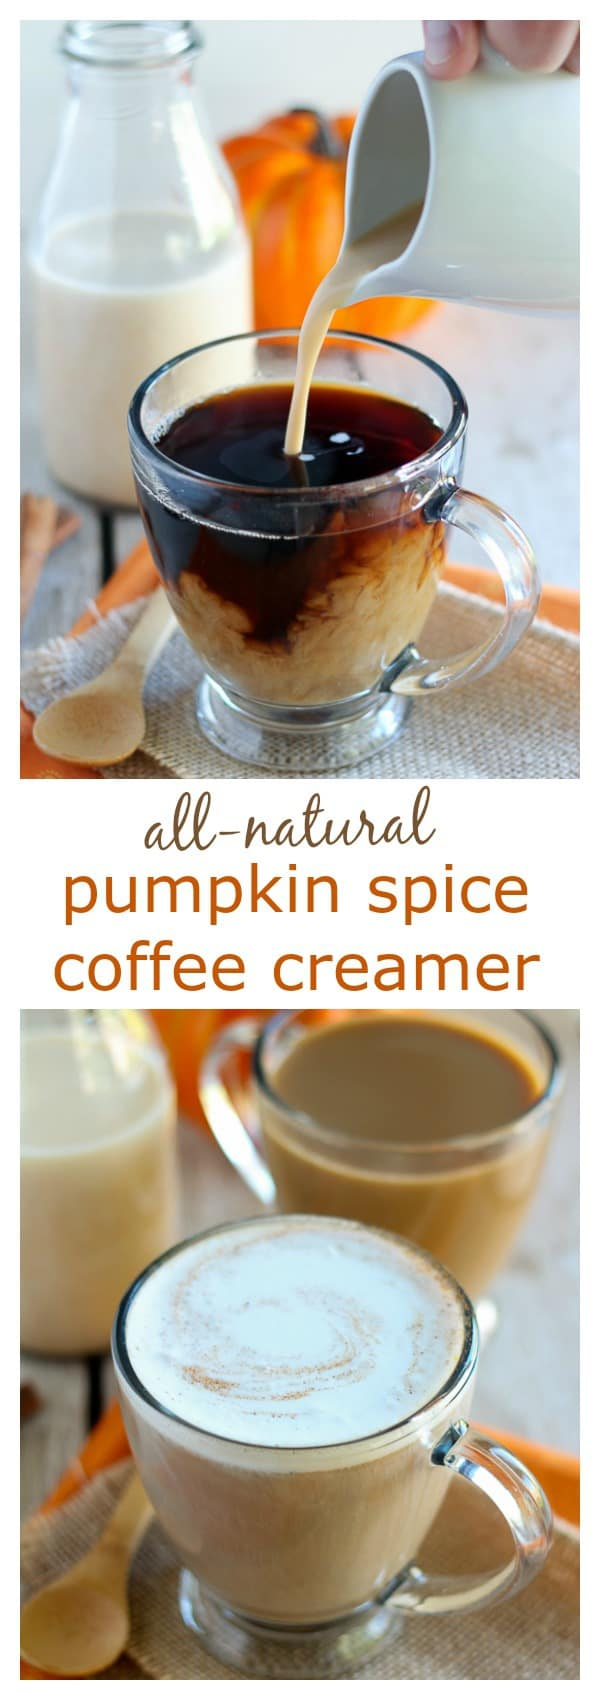 All-Natural Pumpkin Spice Creamer - Homemade pumpkin spice coffee ...